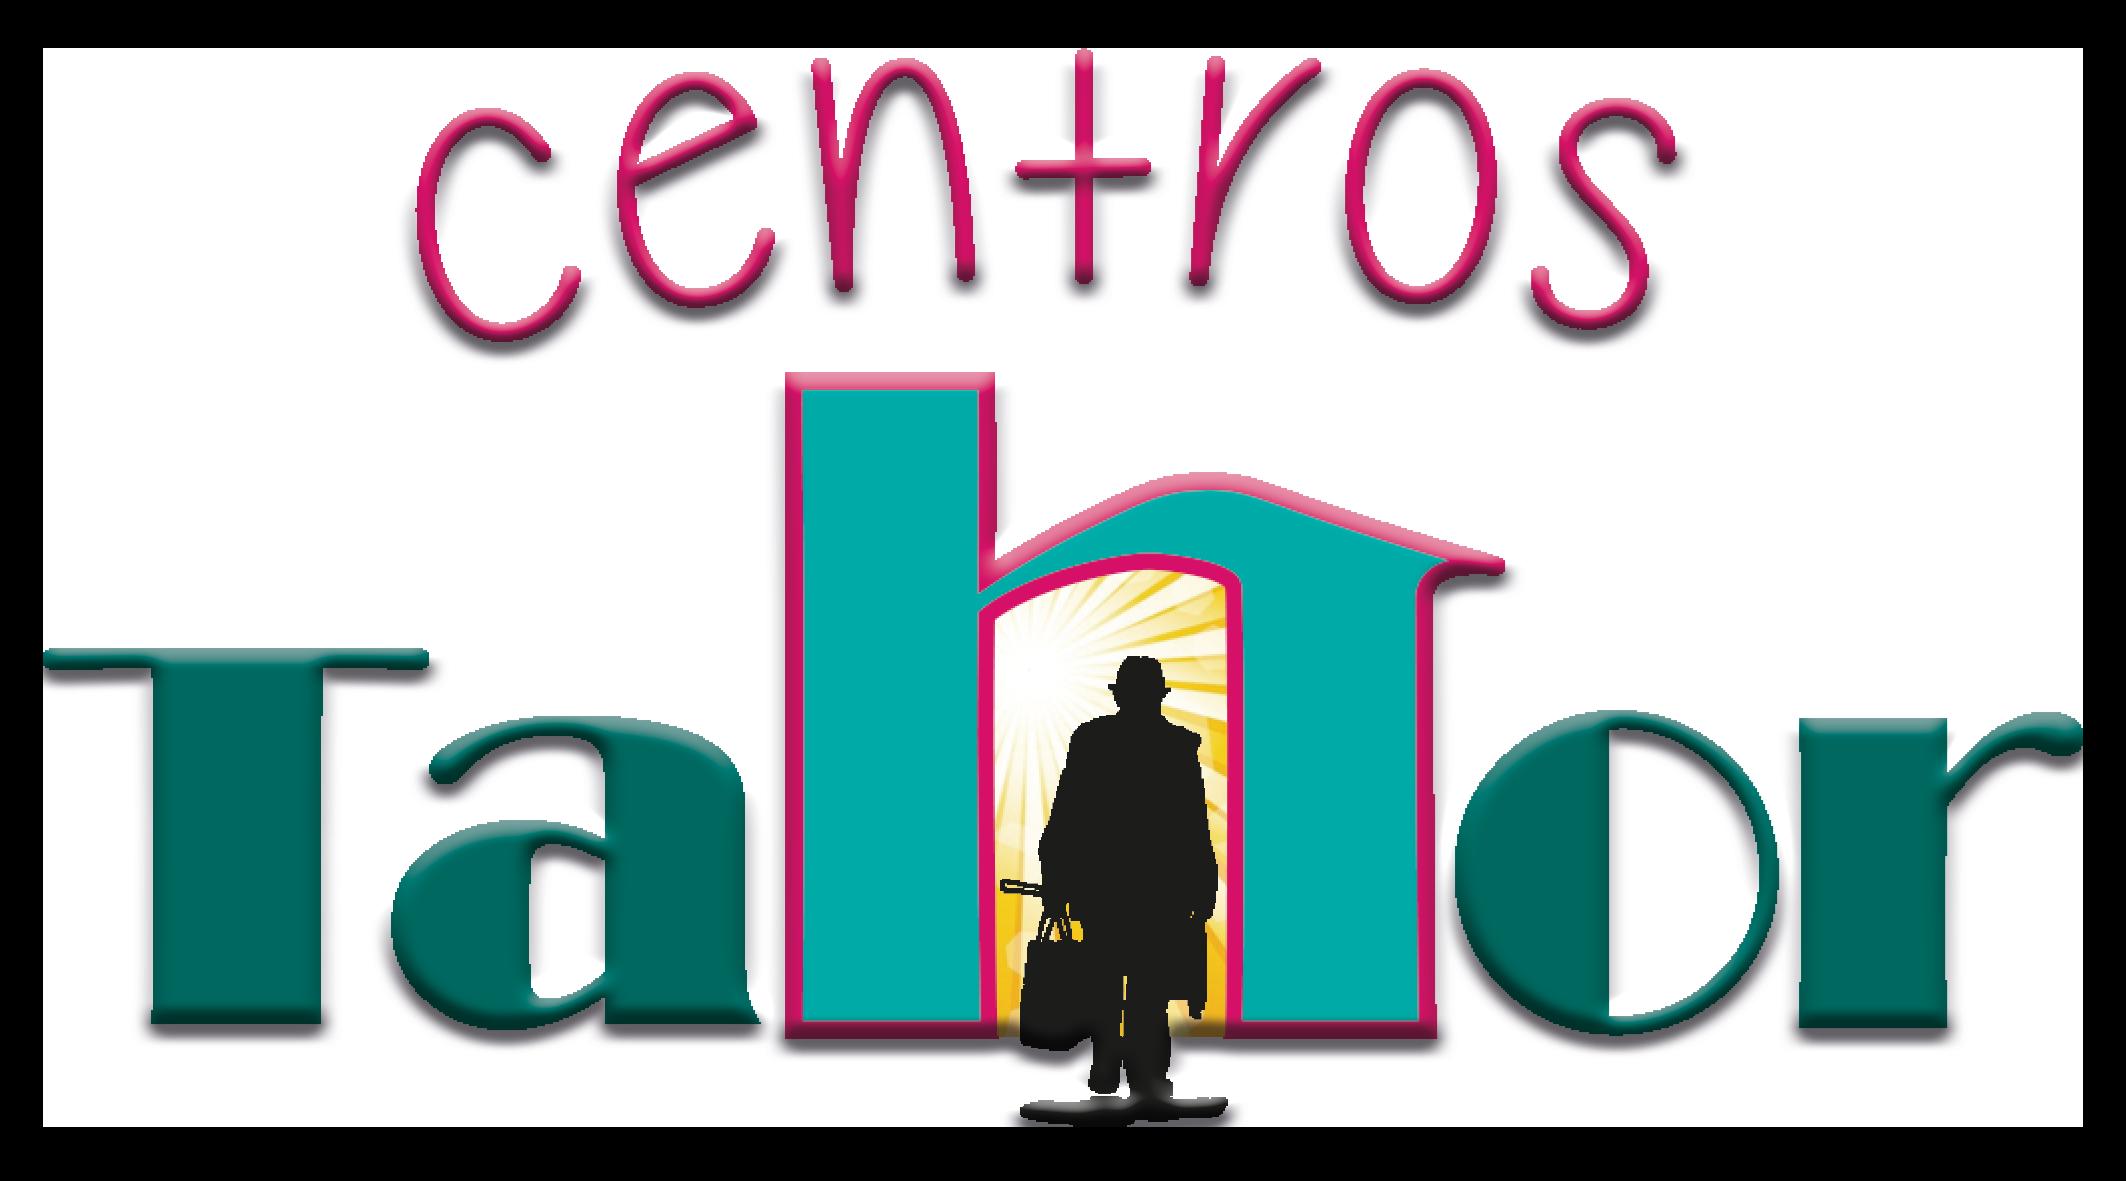 Centros Tahor